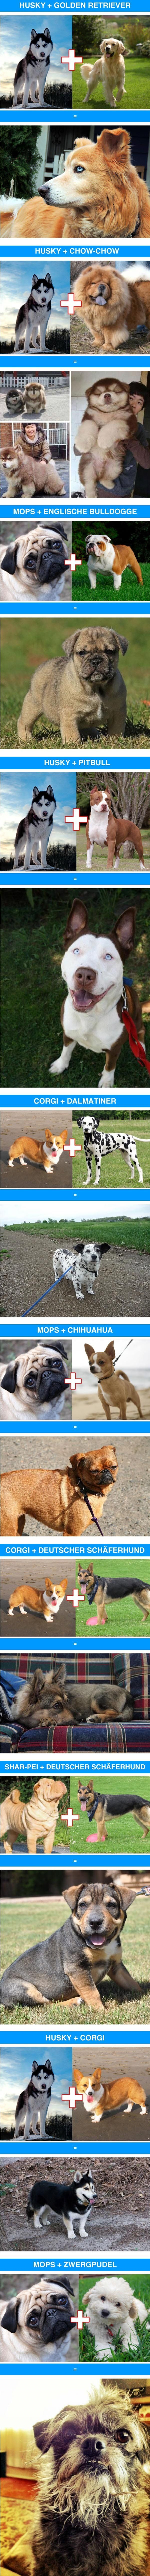 Adorable cross-breeds #Imgur